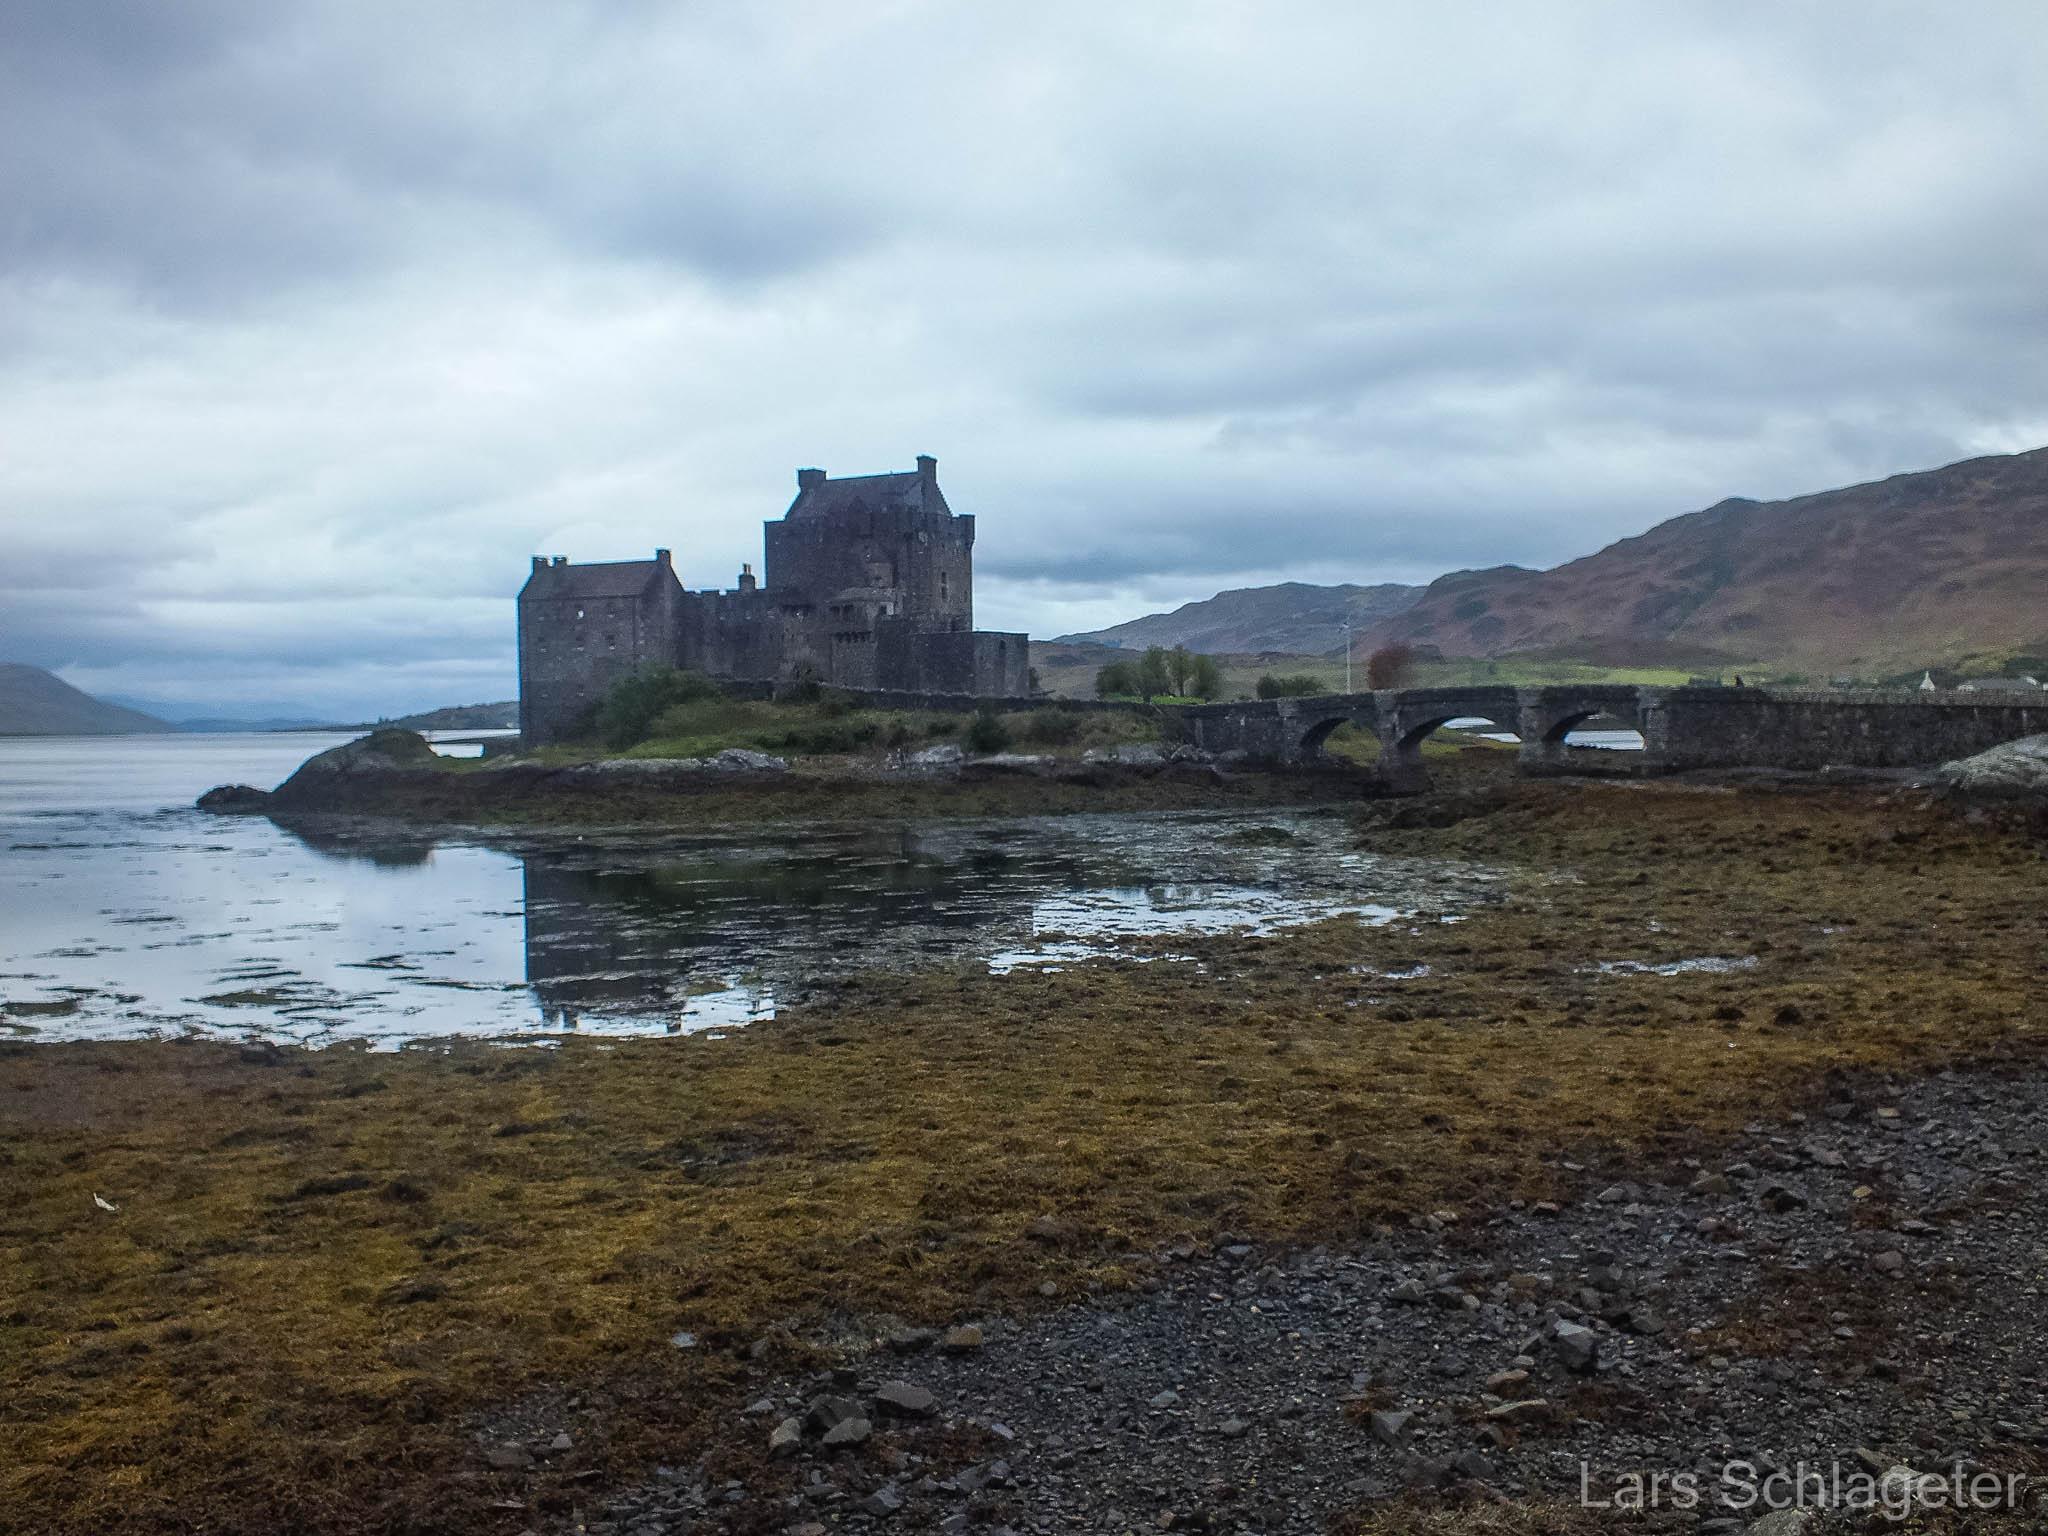 Reisebericht Schottland